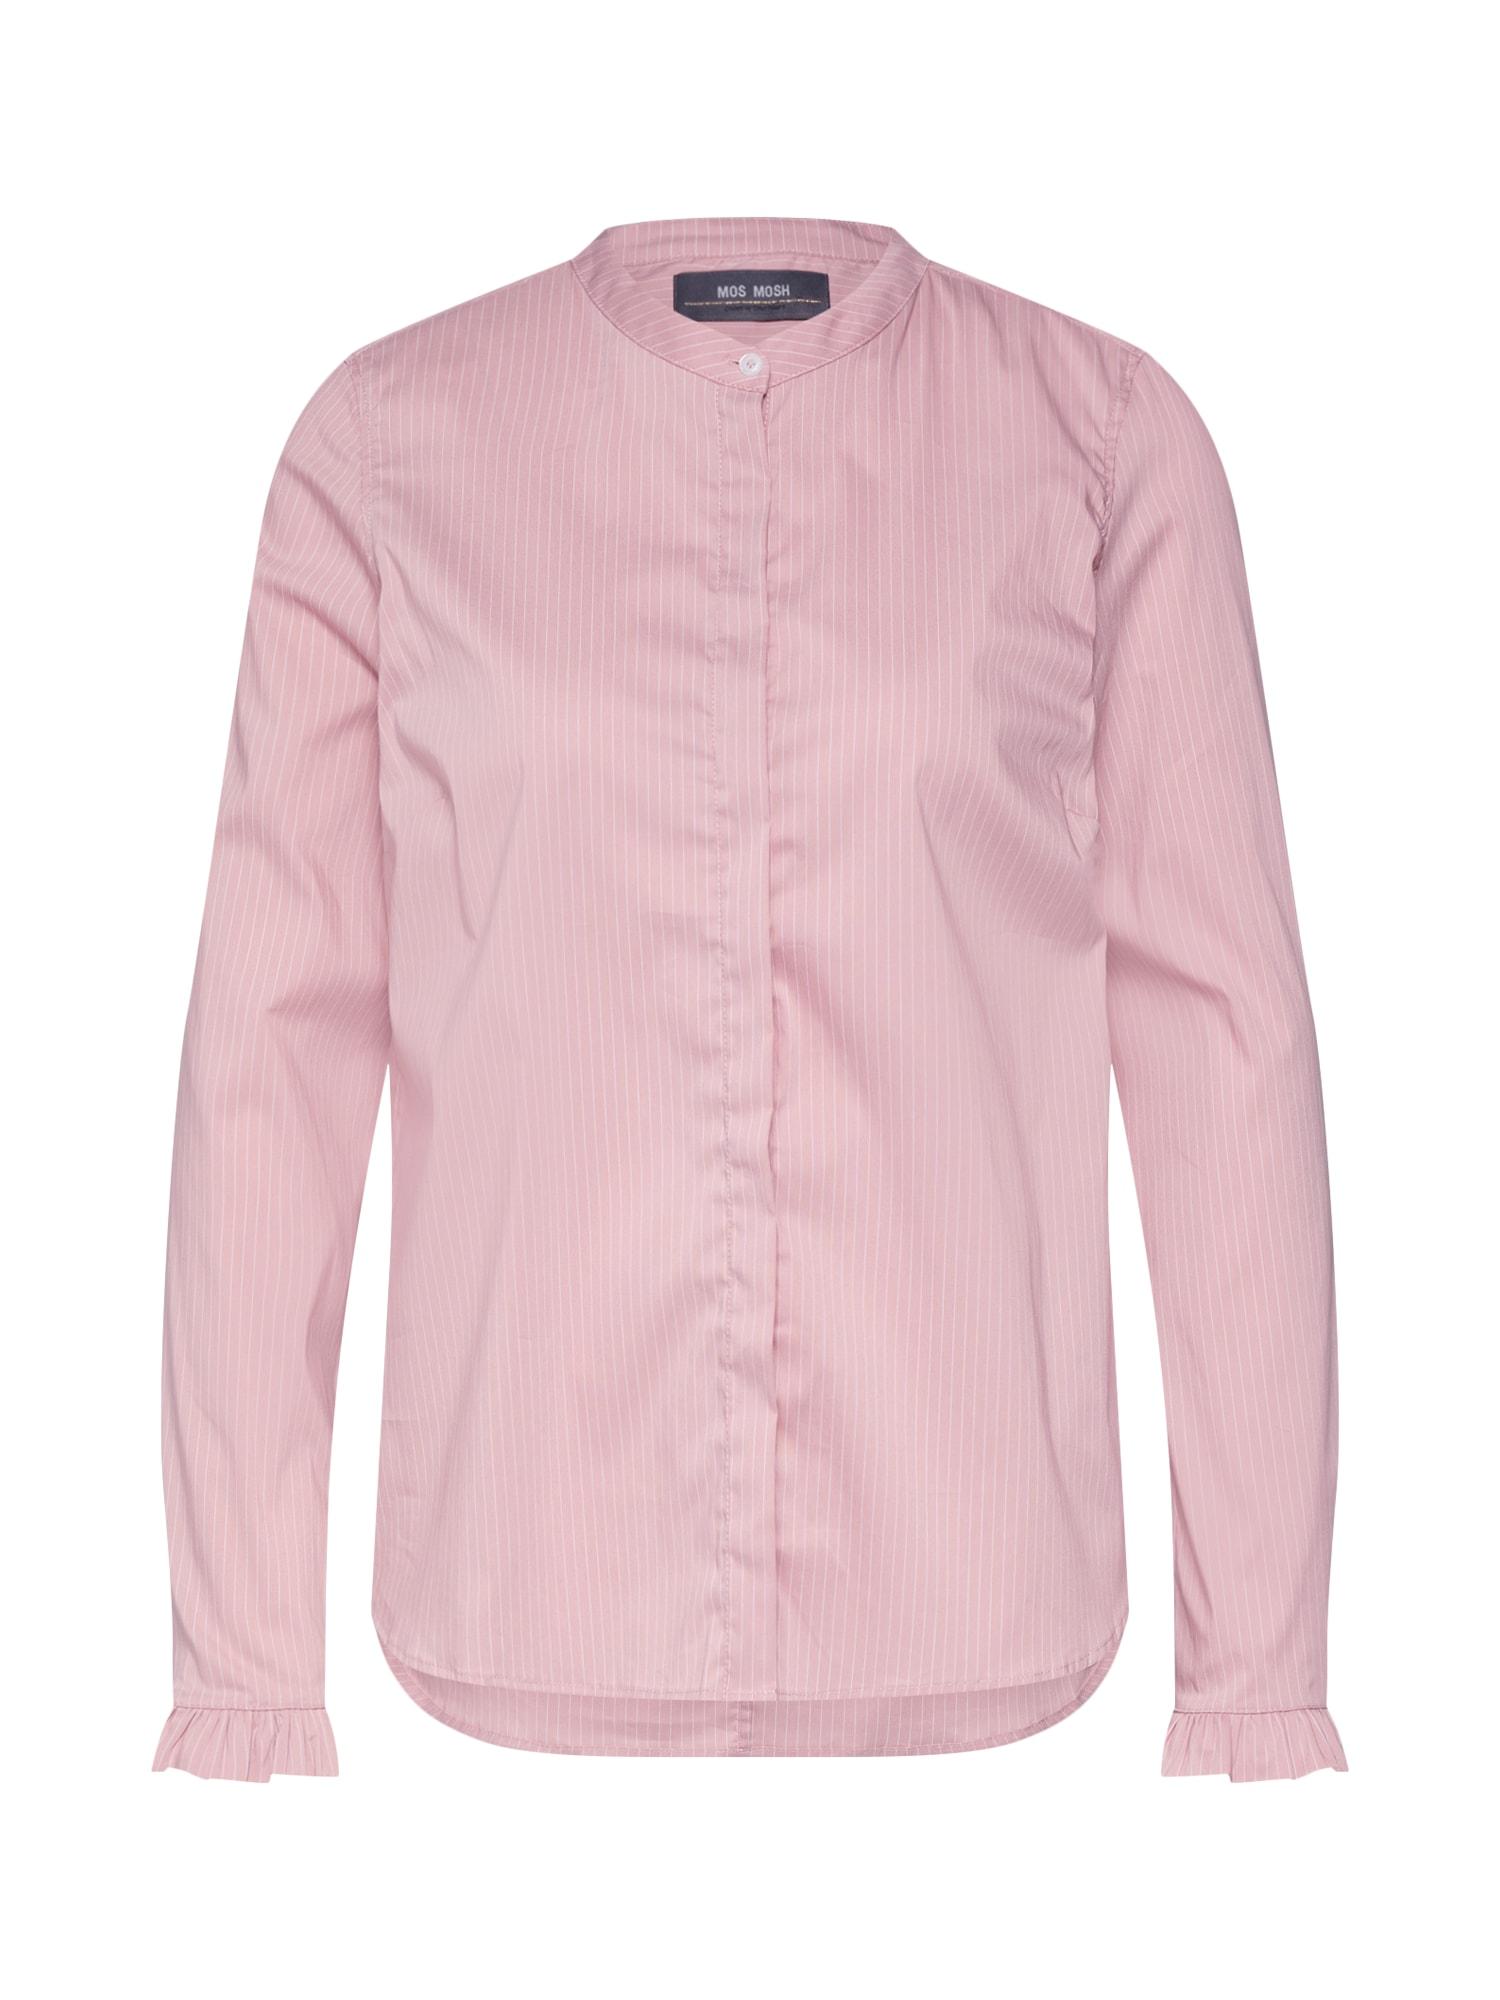 Halenka Mattie Fine Stripe Shirt růže MOS MOSH